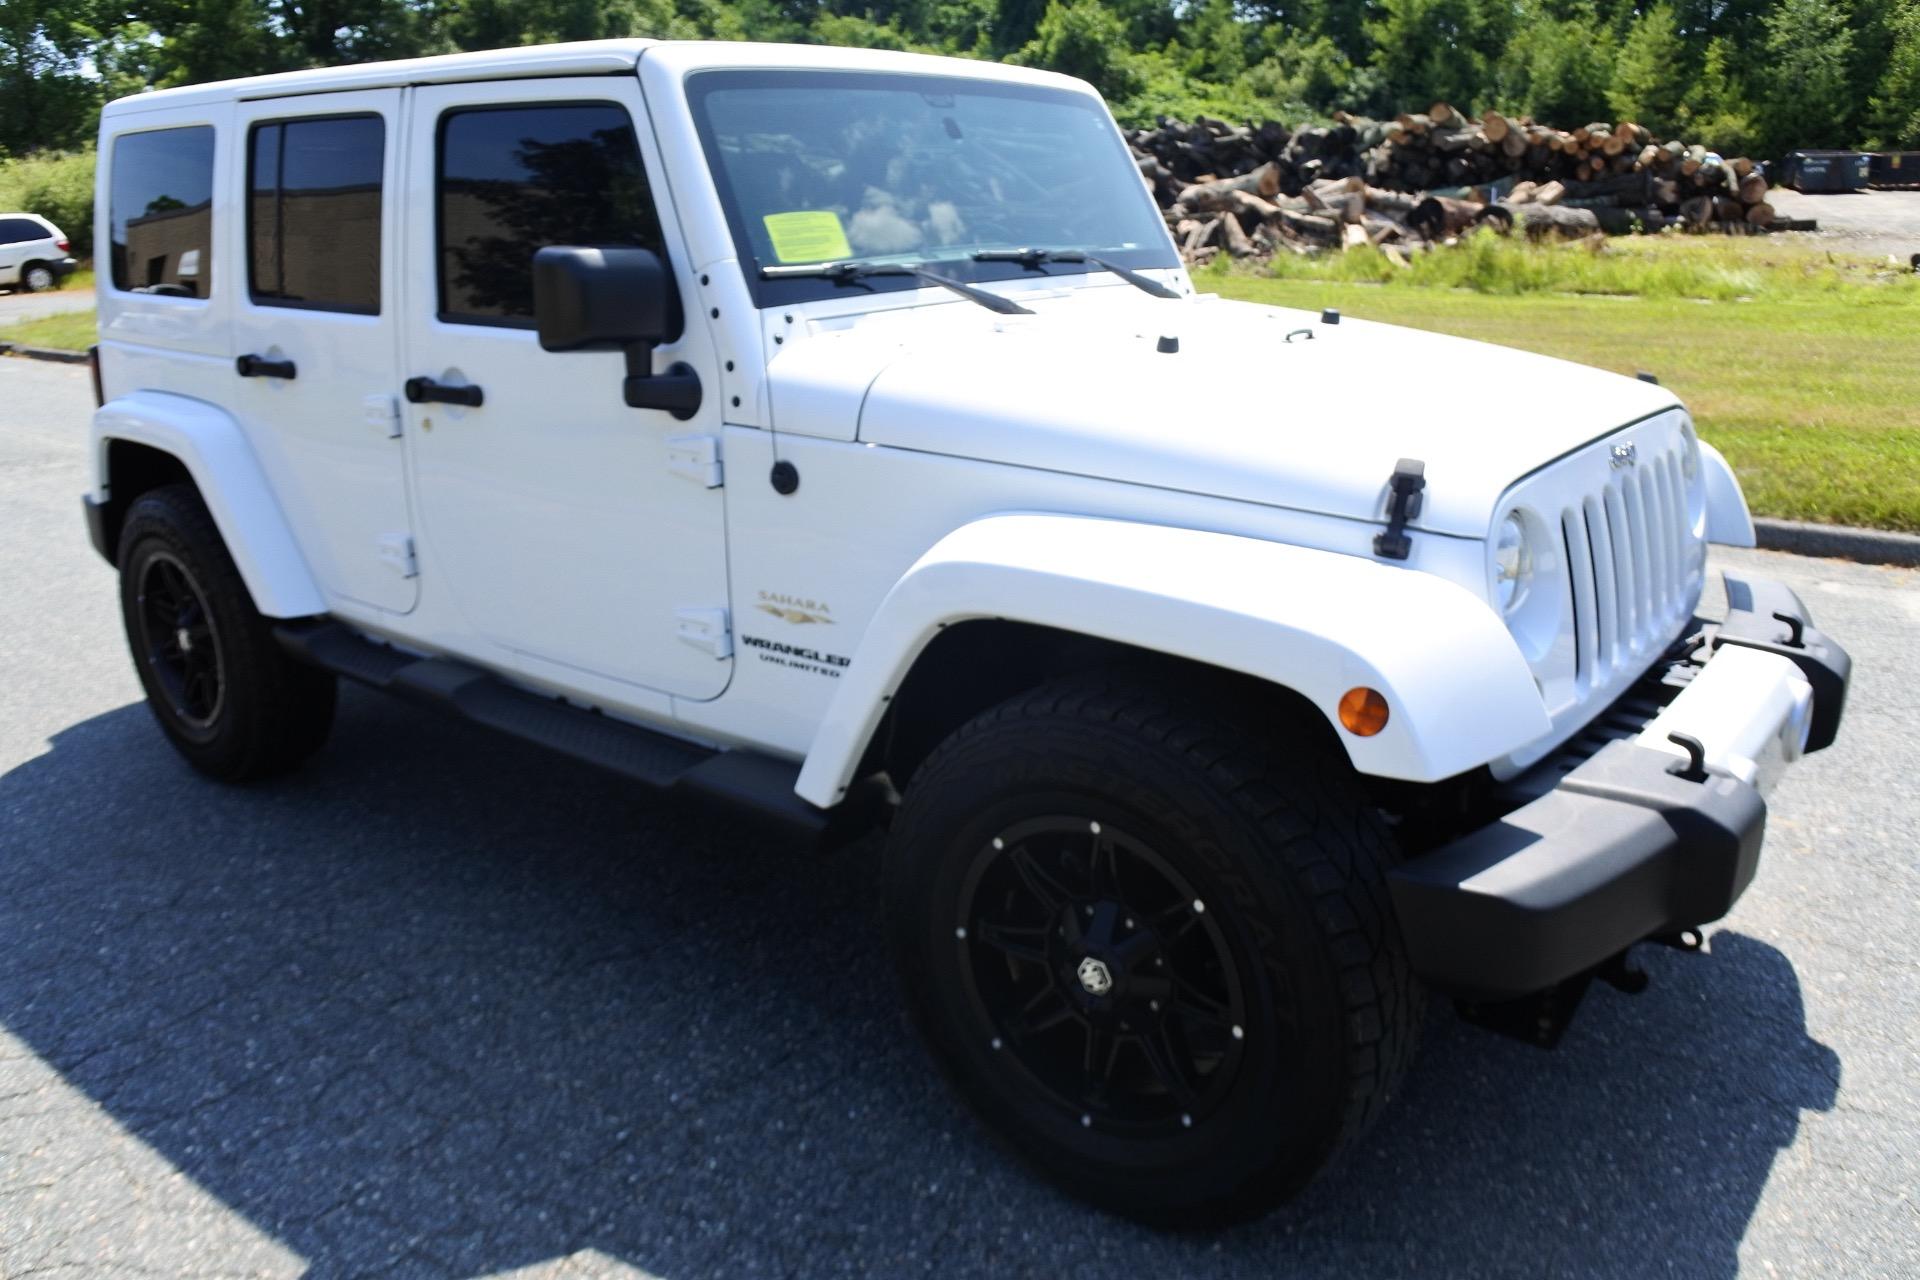 Used 2015 Jeep Wrangler Unlimited 4WD 4dr Sahara Used 2015 Jeep Wrangler Unlimited 4WD 4dr Sahara for sale  at Metro West Motorcars LLC in Shrewsbury MA 7